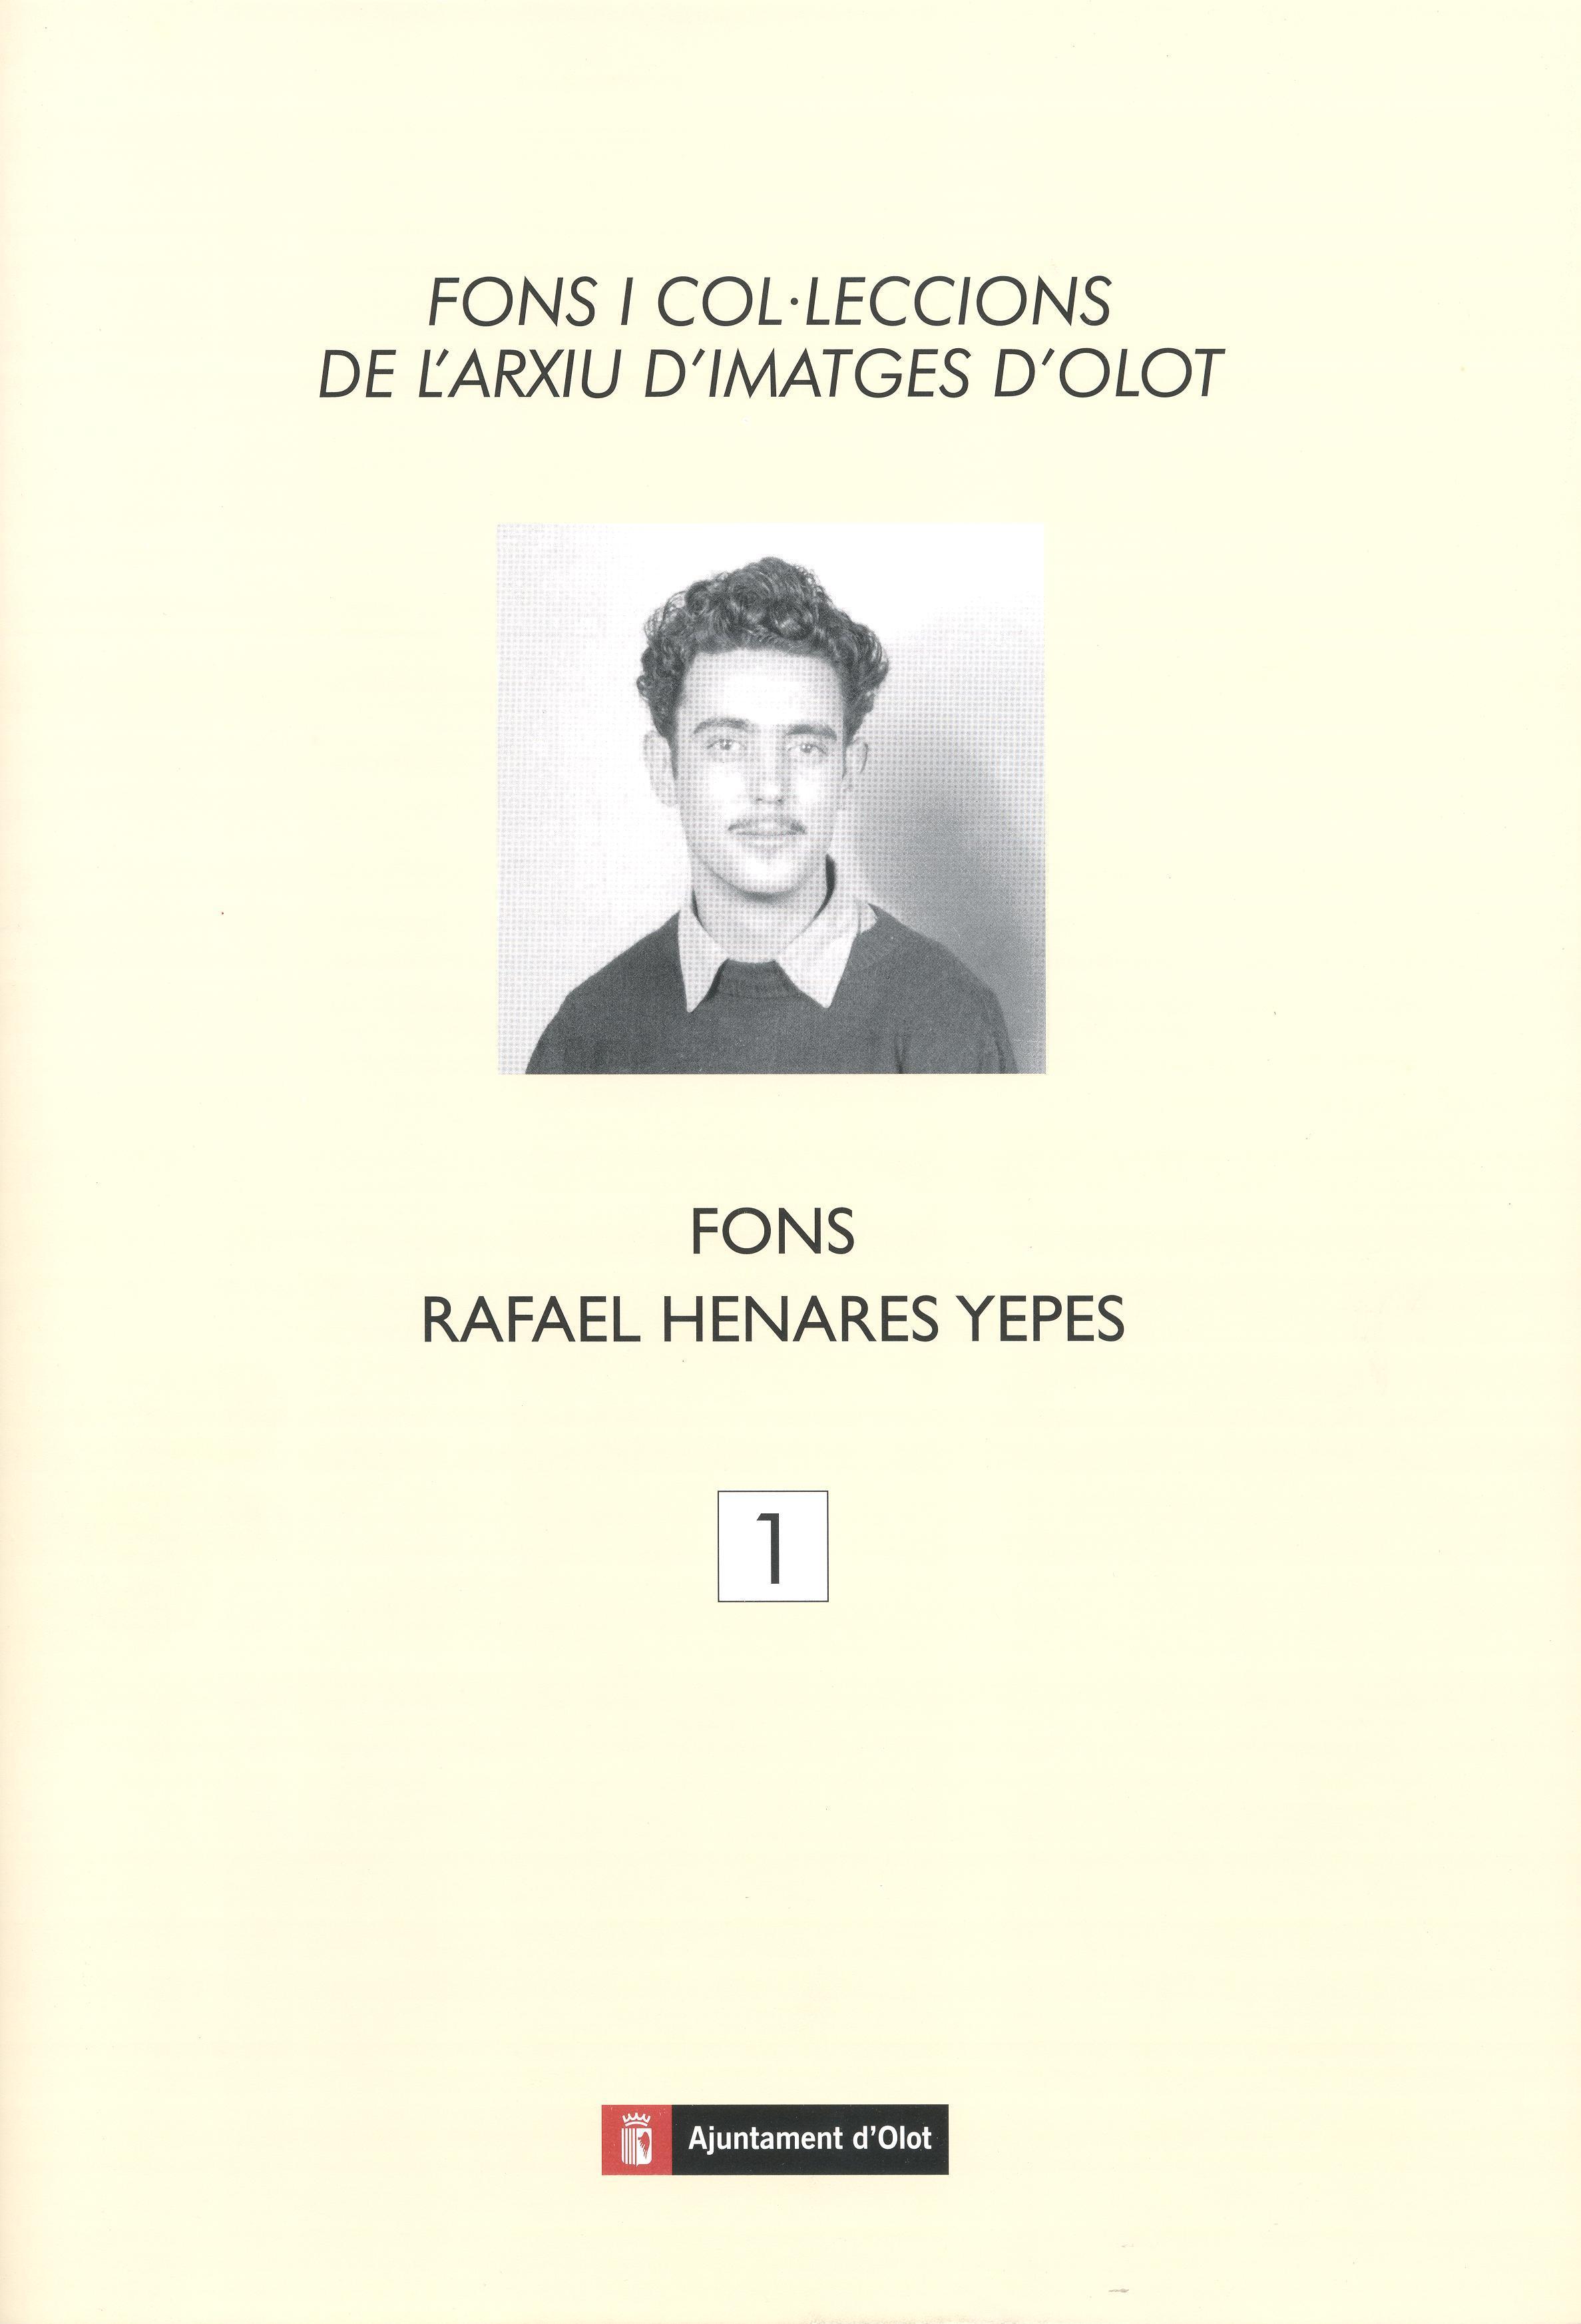 Coberta llibre fotògraf Fons Rafael Henares Yepes. ACGAX